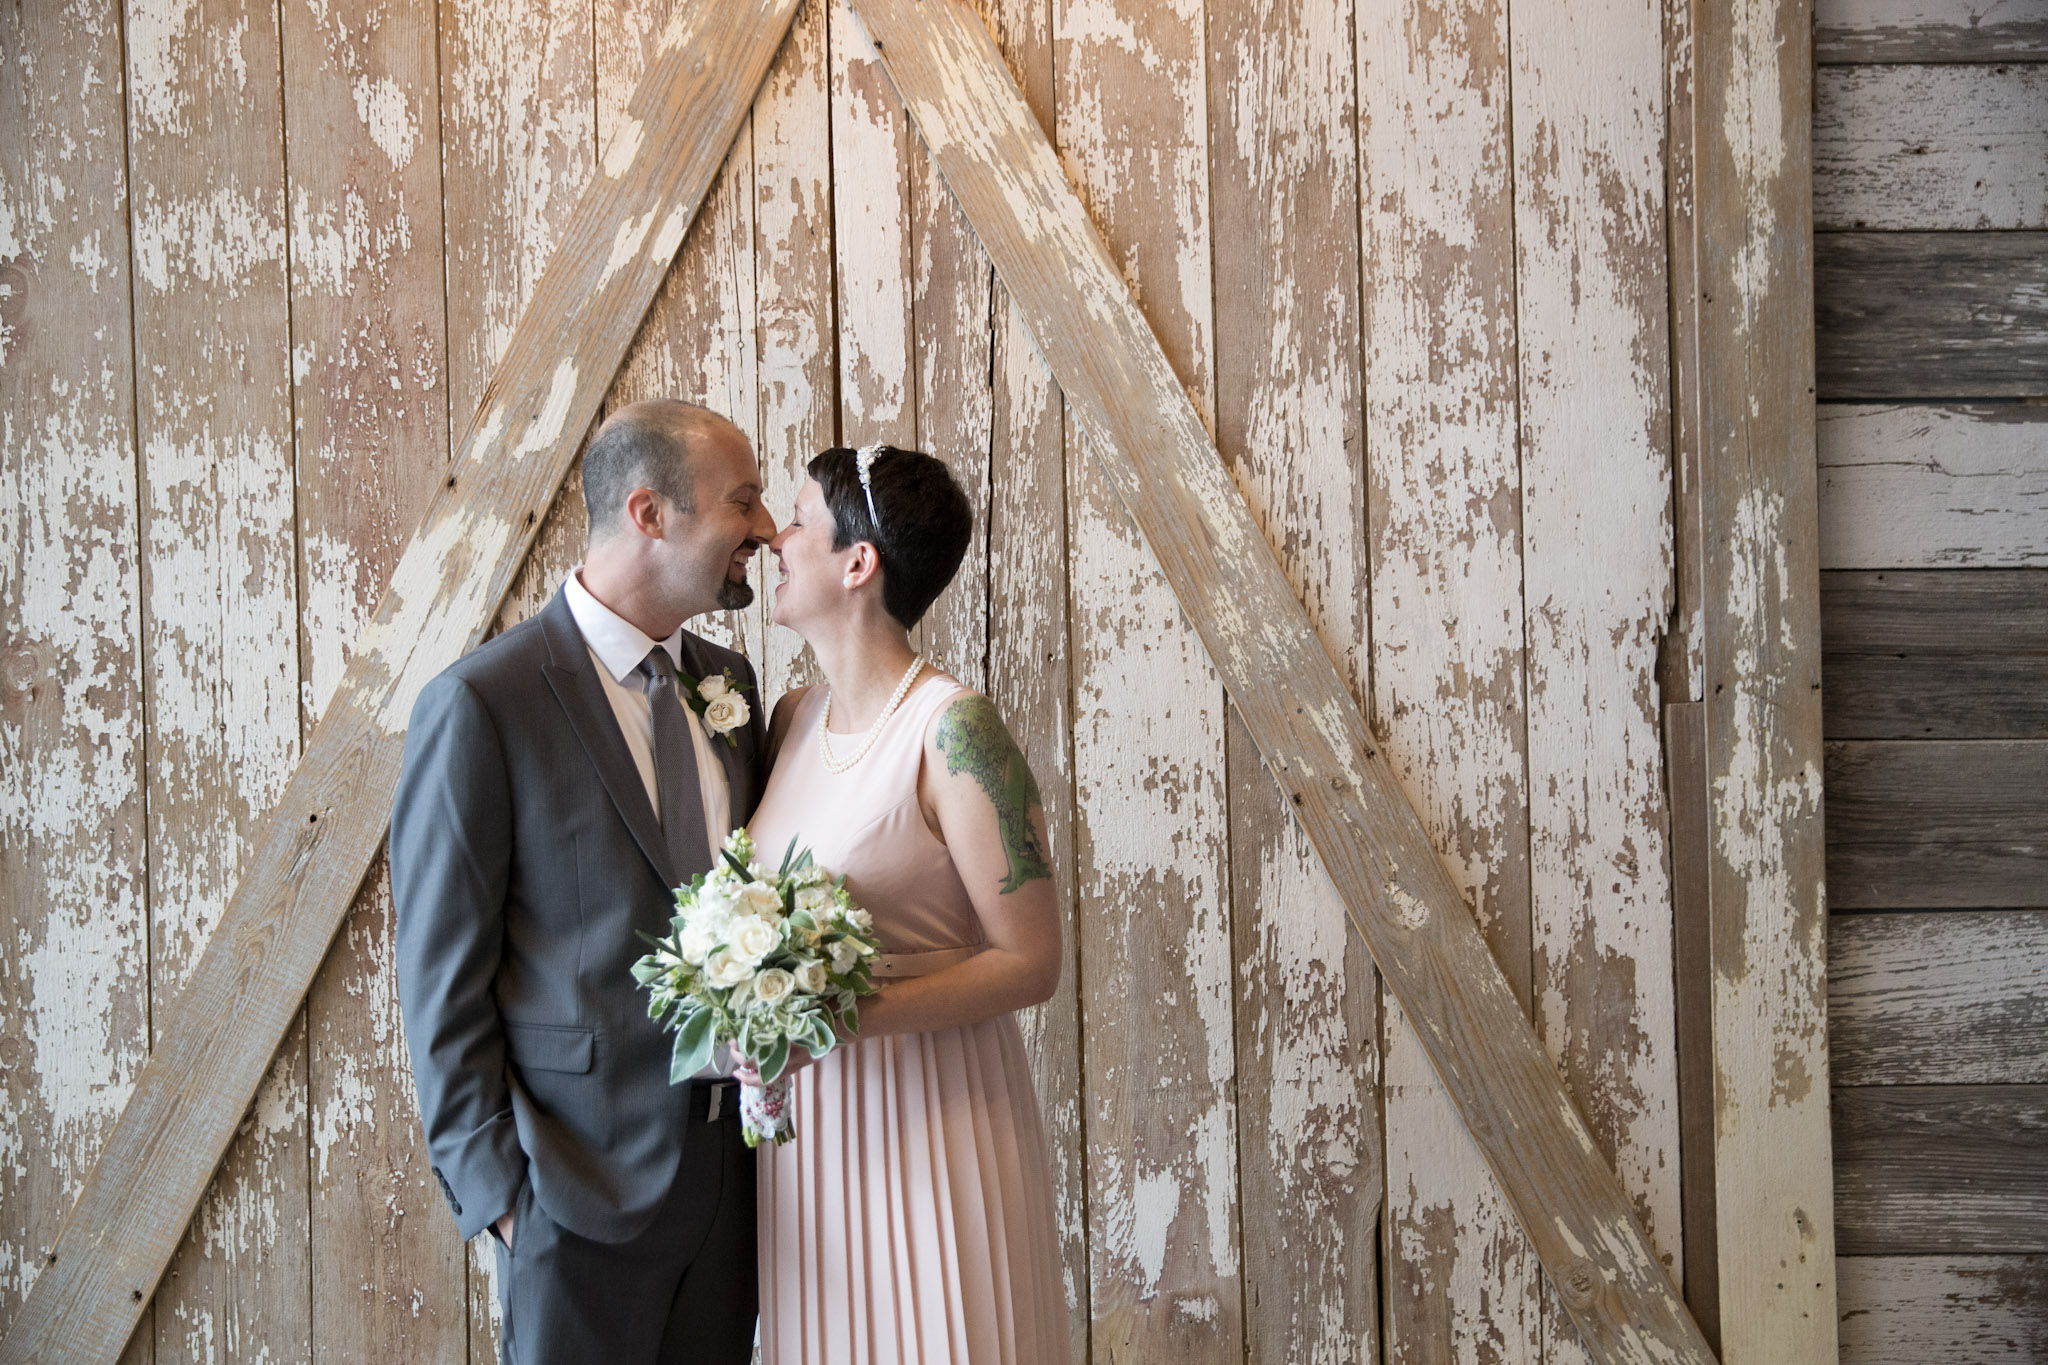 Kansas_City_Small_Wedding_Venue_Elope_Intimate_Ceremony_Budget_Affordable_IMG_1263.jpg